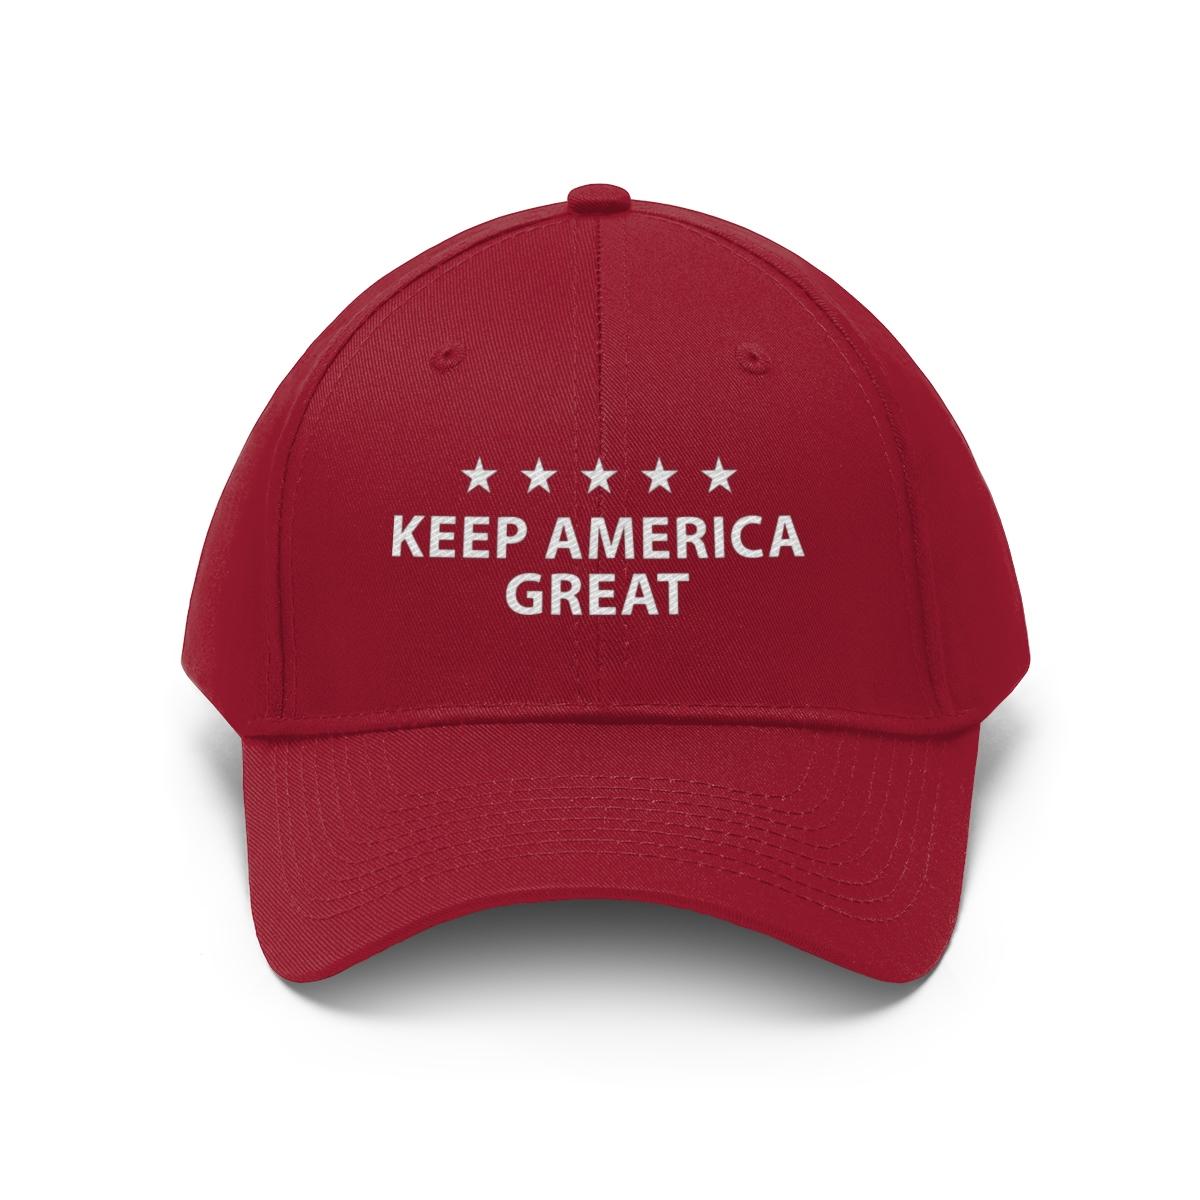 010cc810b3072 Trump 2020 Keep America Great Hat Red - Trump 2020 Apparel Store